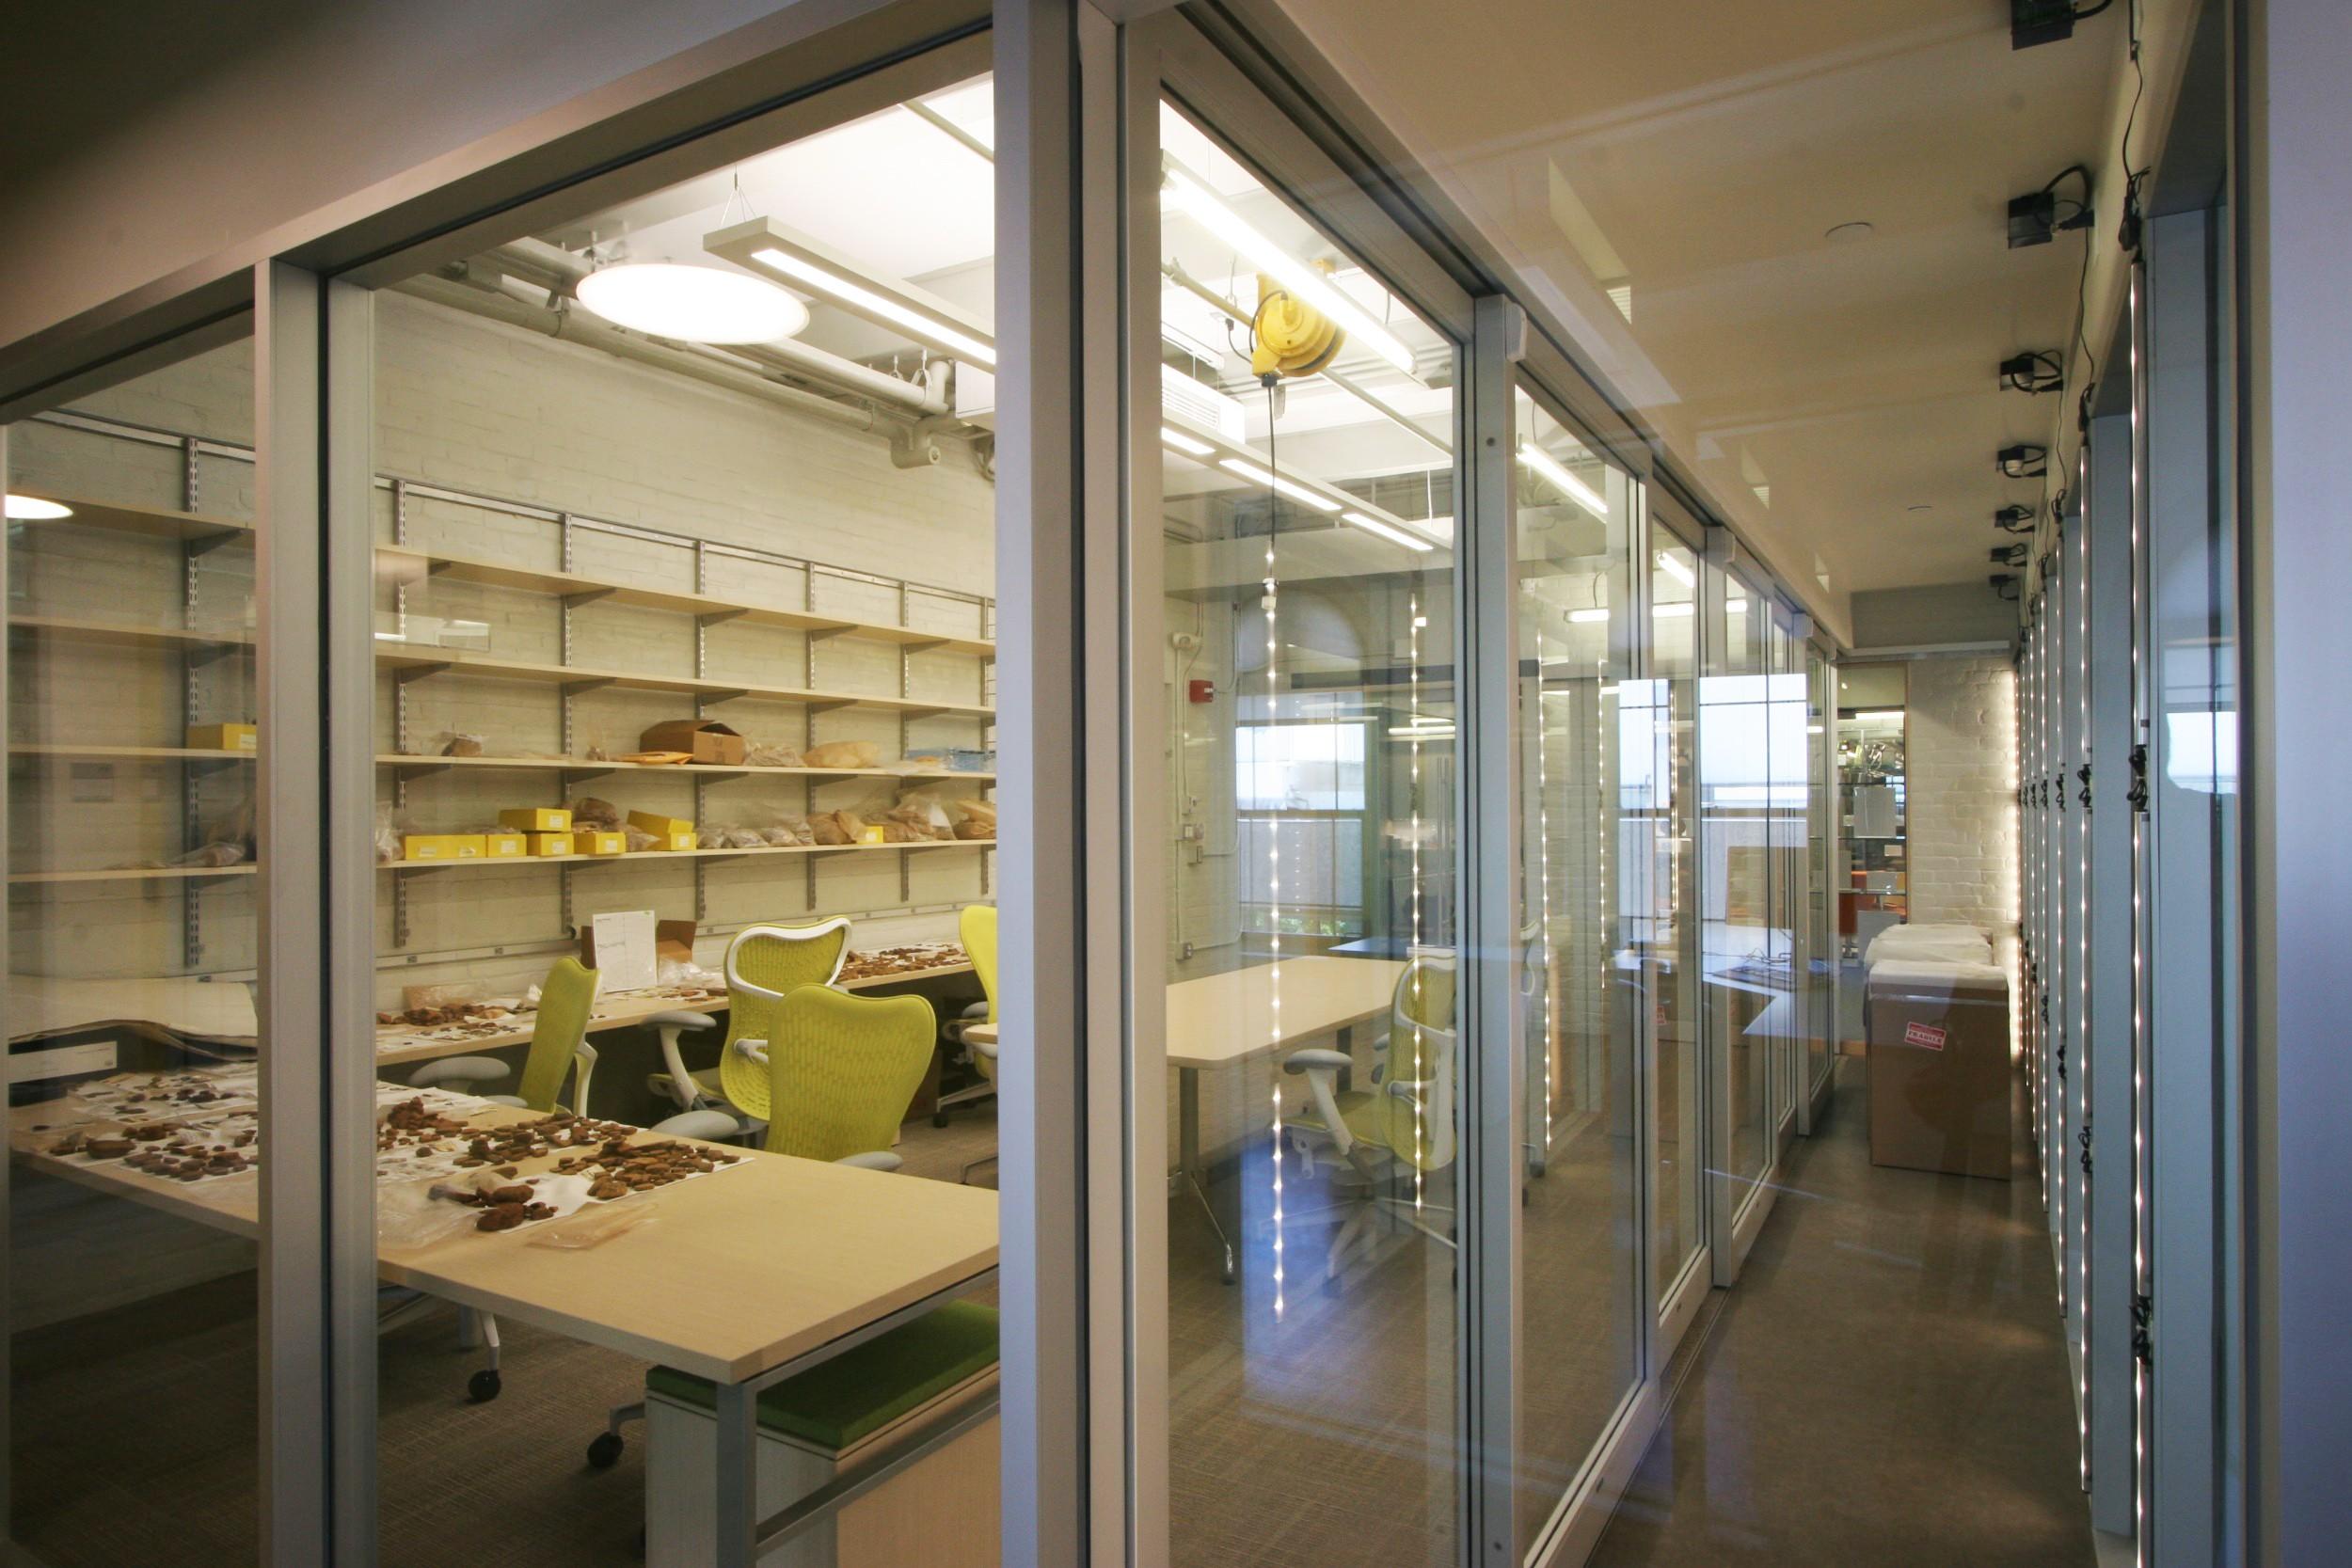 Harvard_University_Corderman_Construction_Anthropology_Department_Hallway.jpg